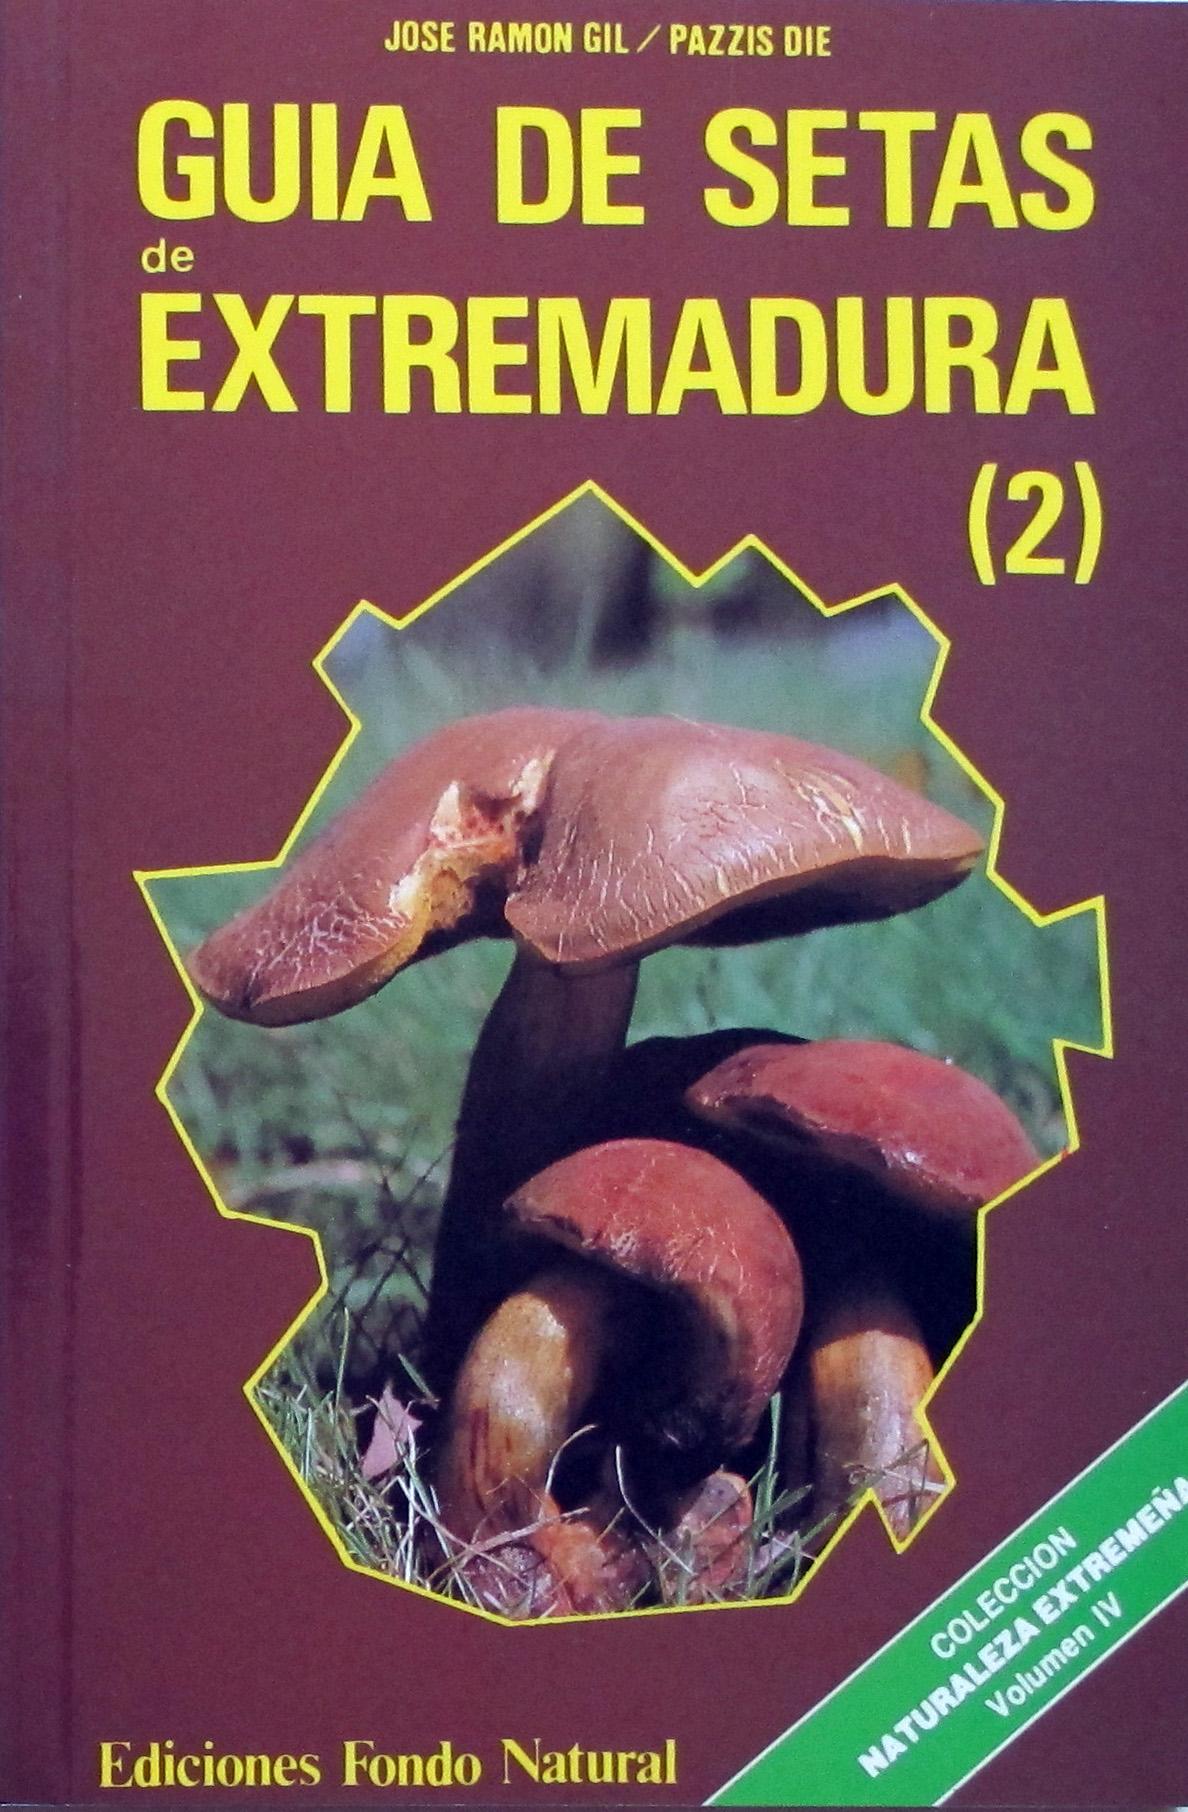 Libro GUIA DE SETAS DE EXTREMADURA - 2